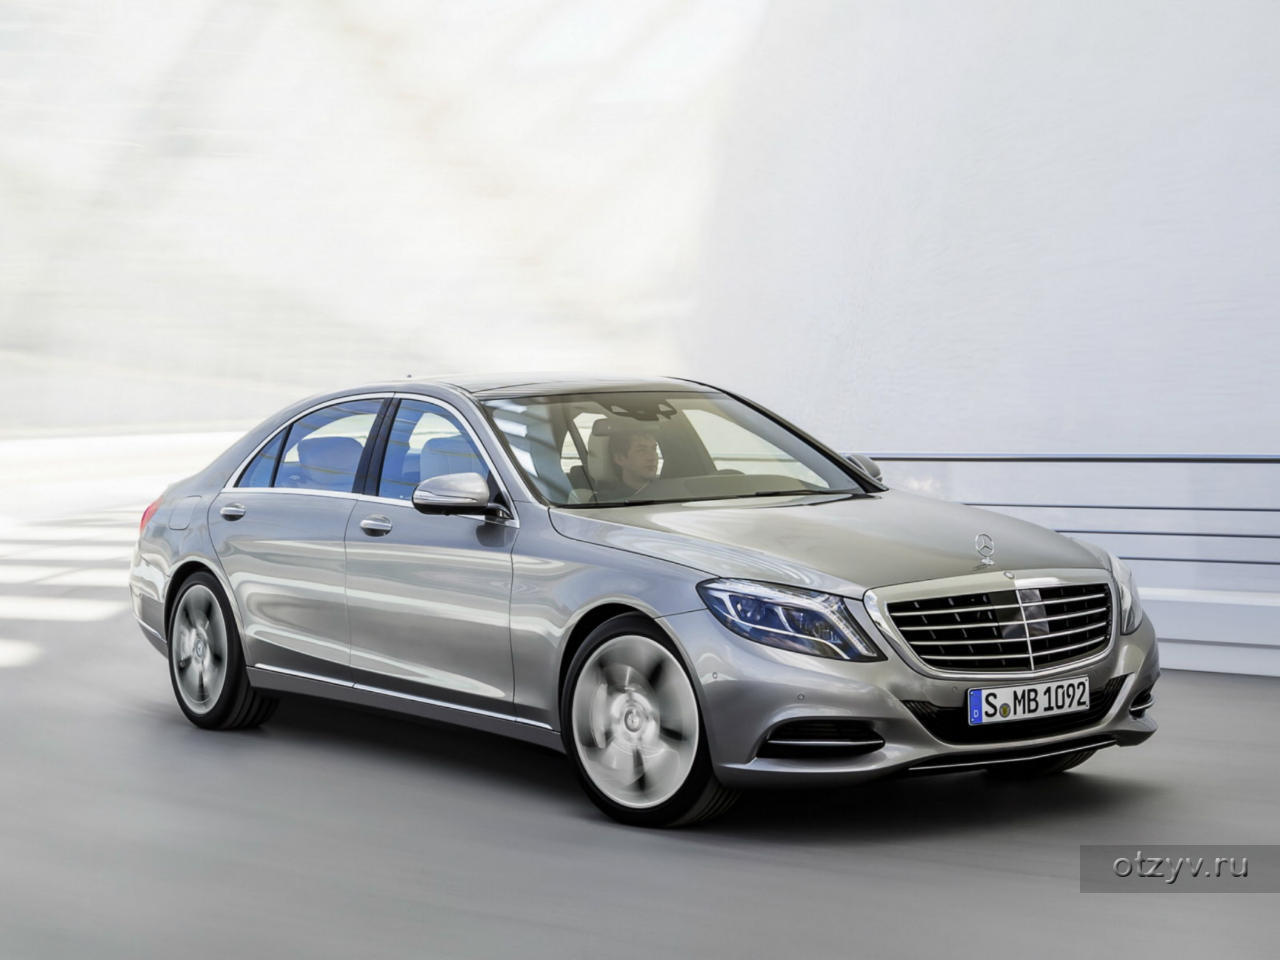 Mercedes-Benz GLE (2016-2017) - allcarz.ru